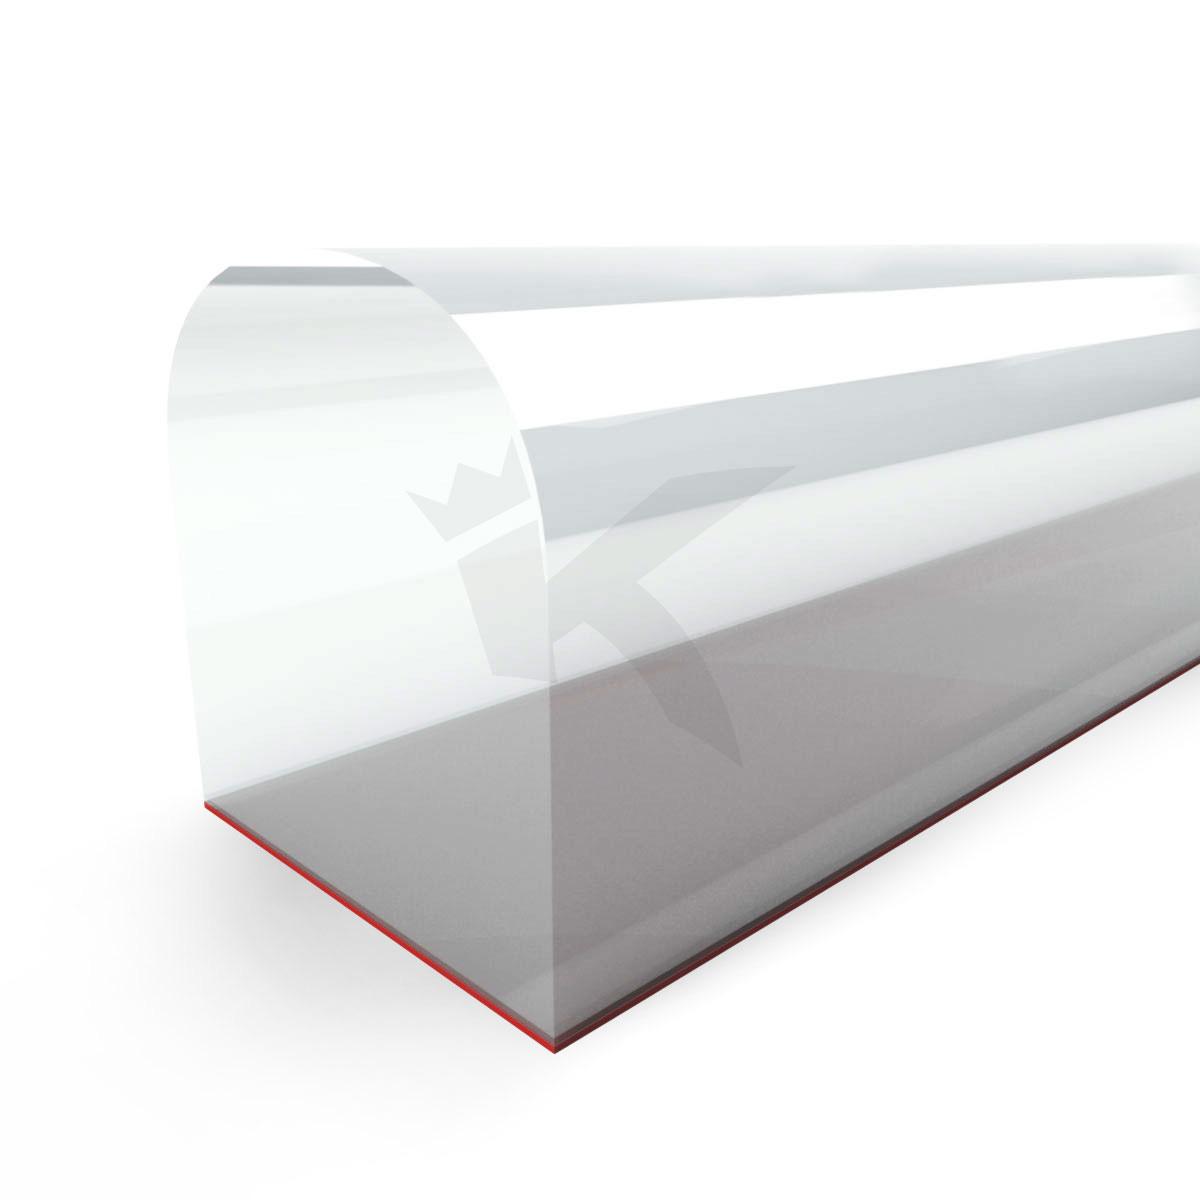 acryl dichtung glasdusche schwallschutz duschdichtung. Black Bedroom Furniture Sets. Home Design Ideas